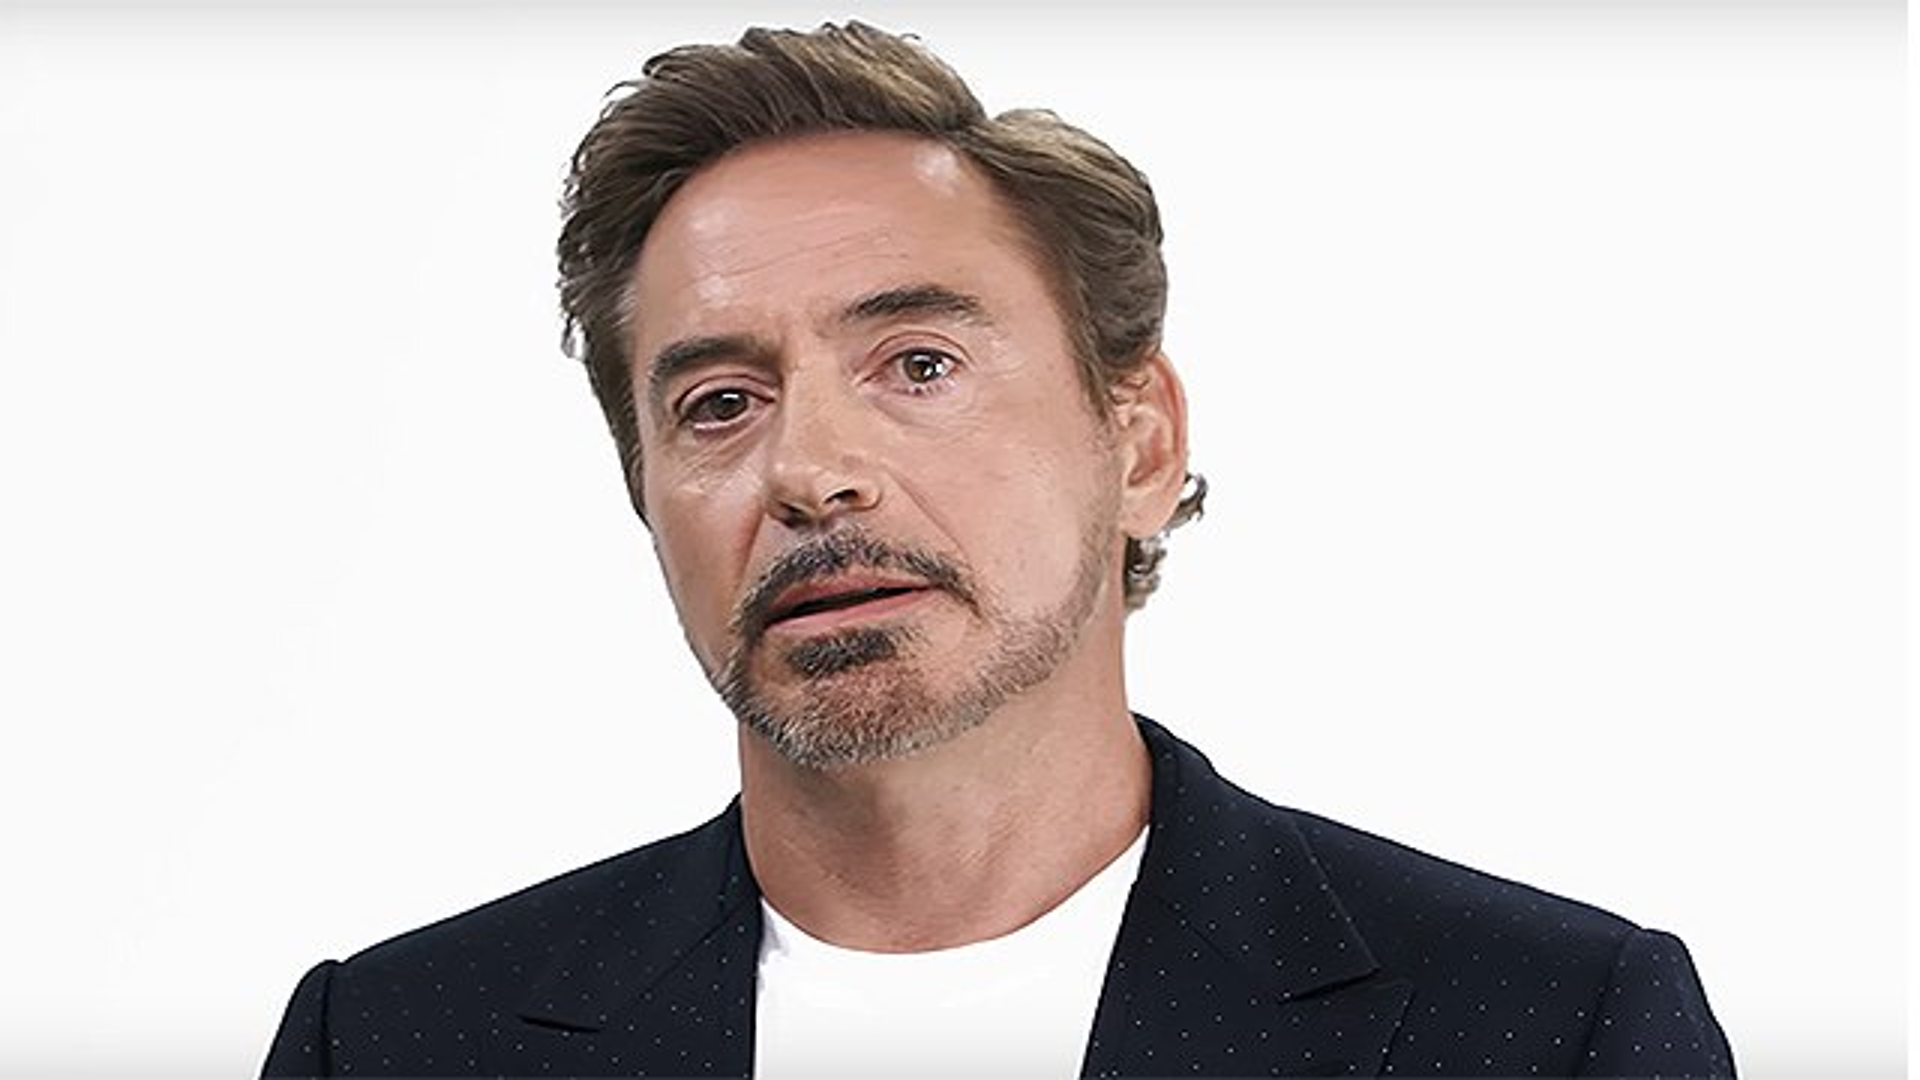 Robert-Downey-Jr-Wahlvideo-2016